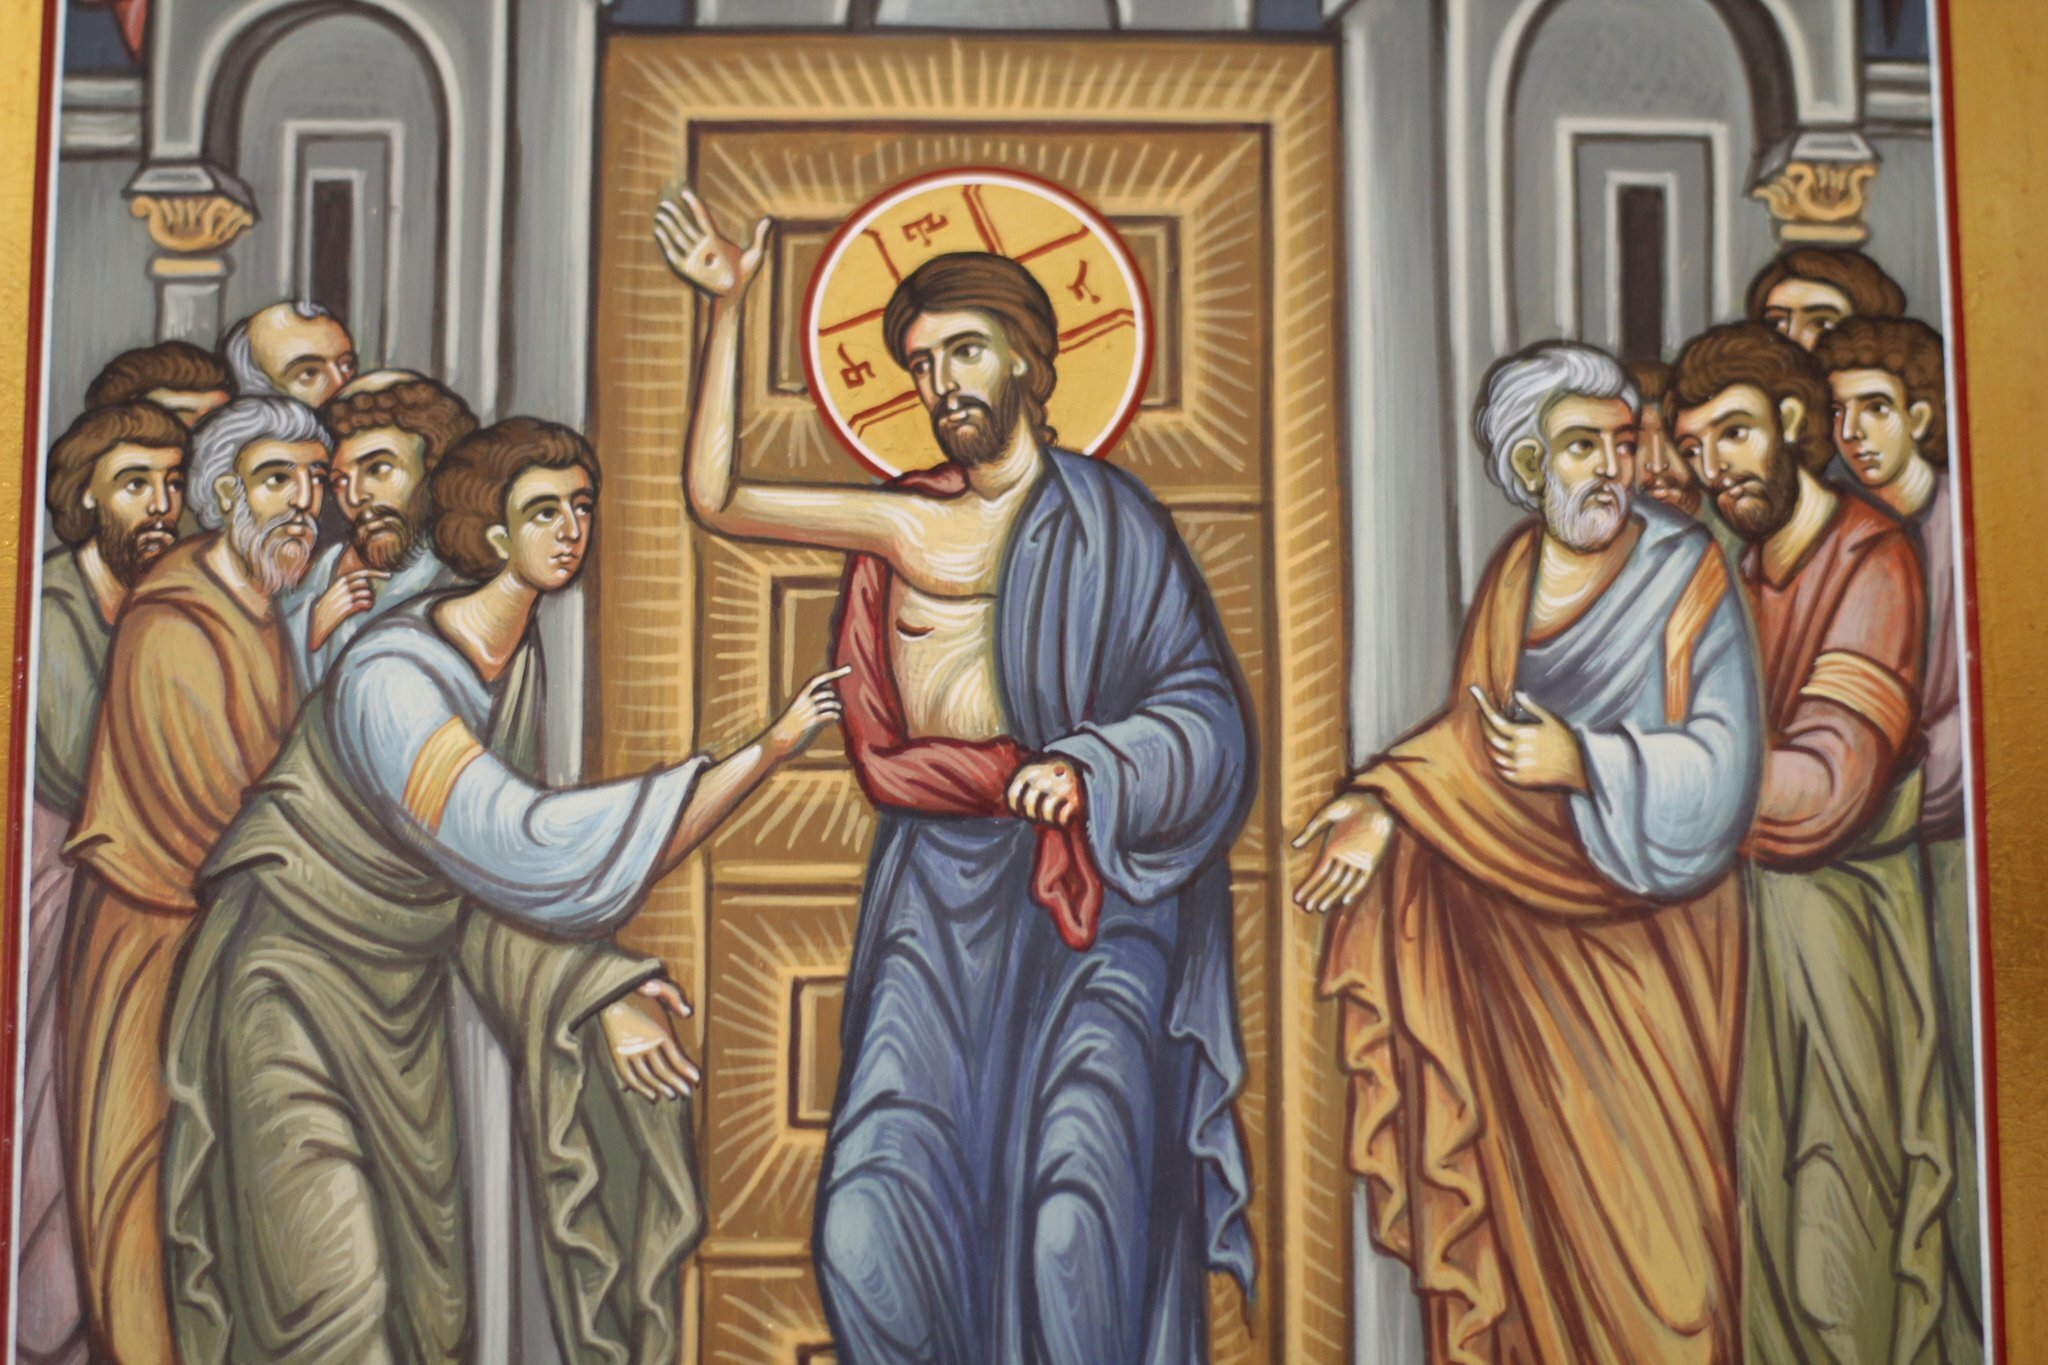 Jesus, Thomas and the other apostles